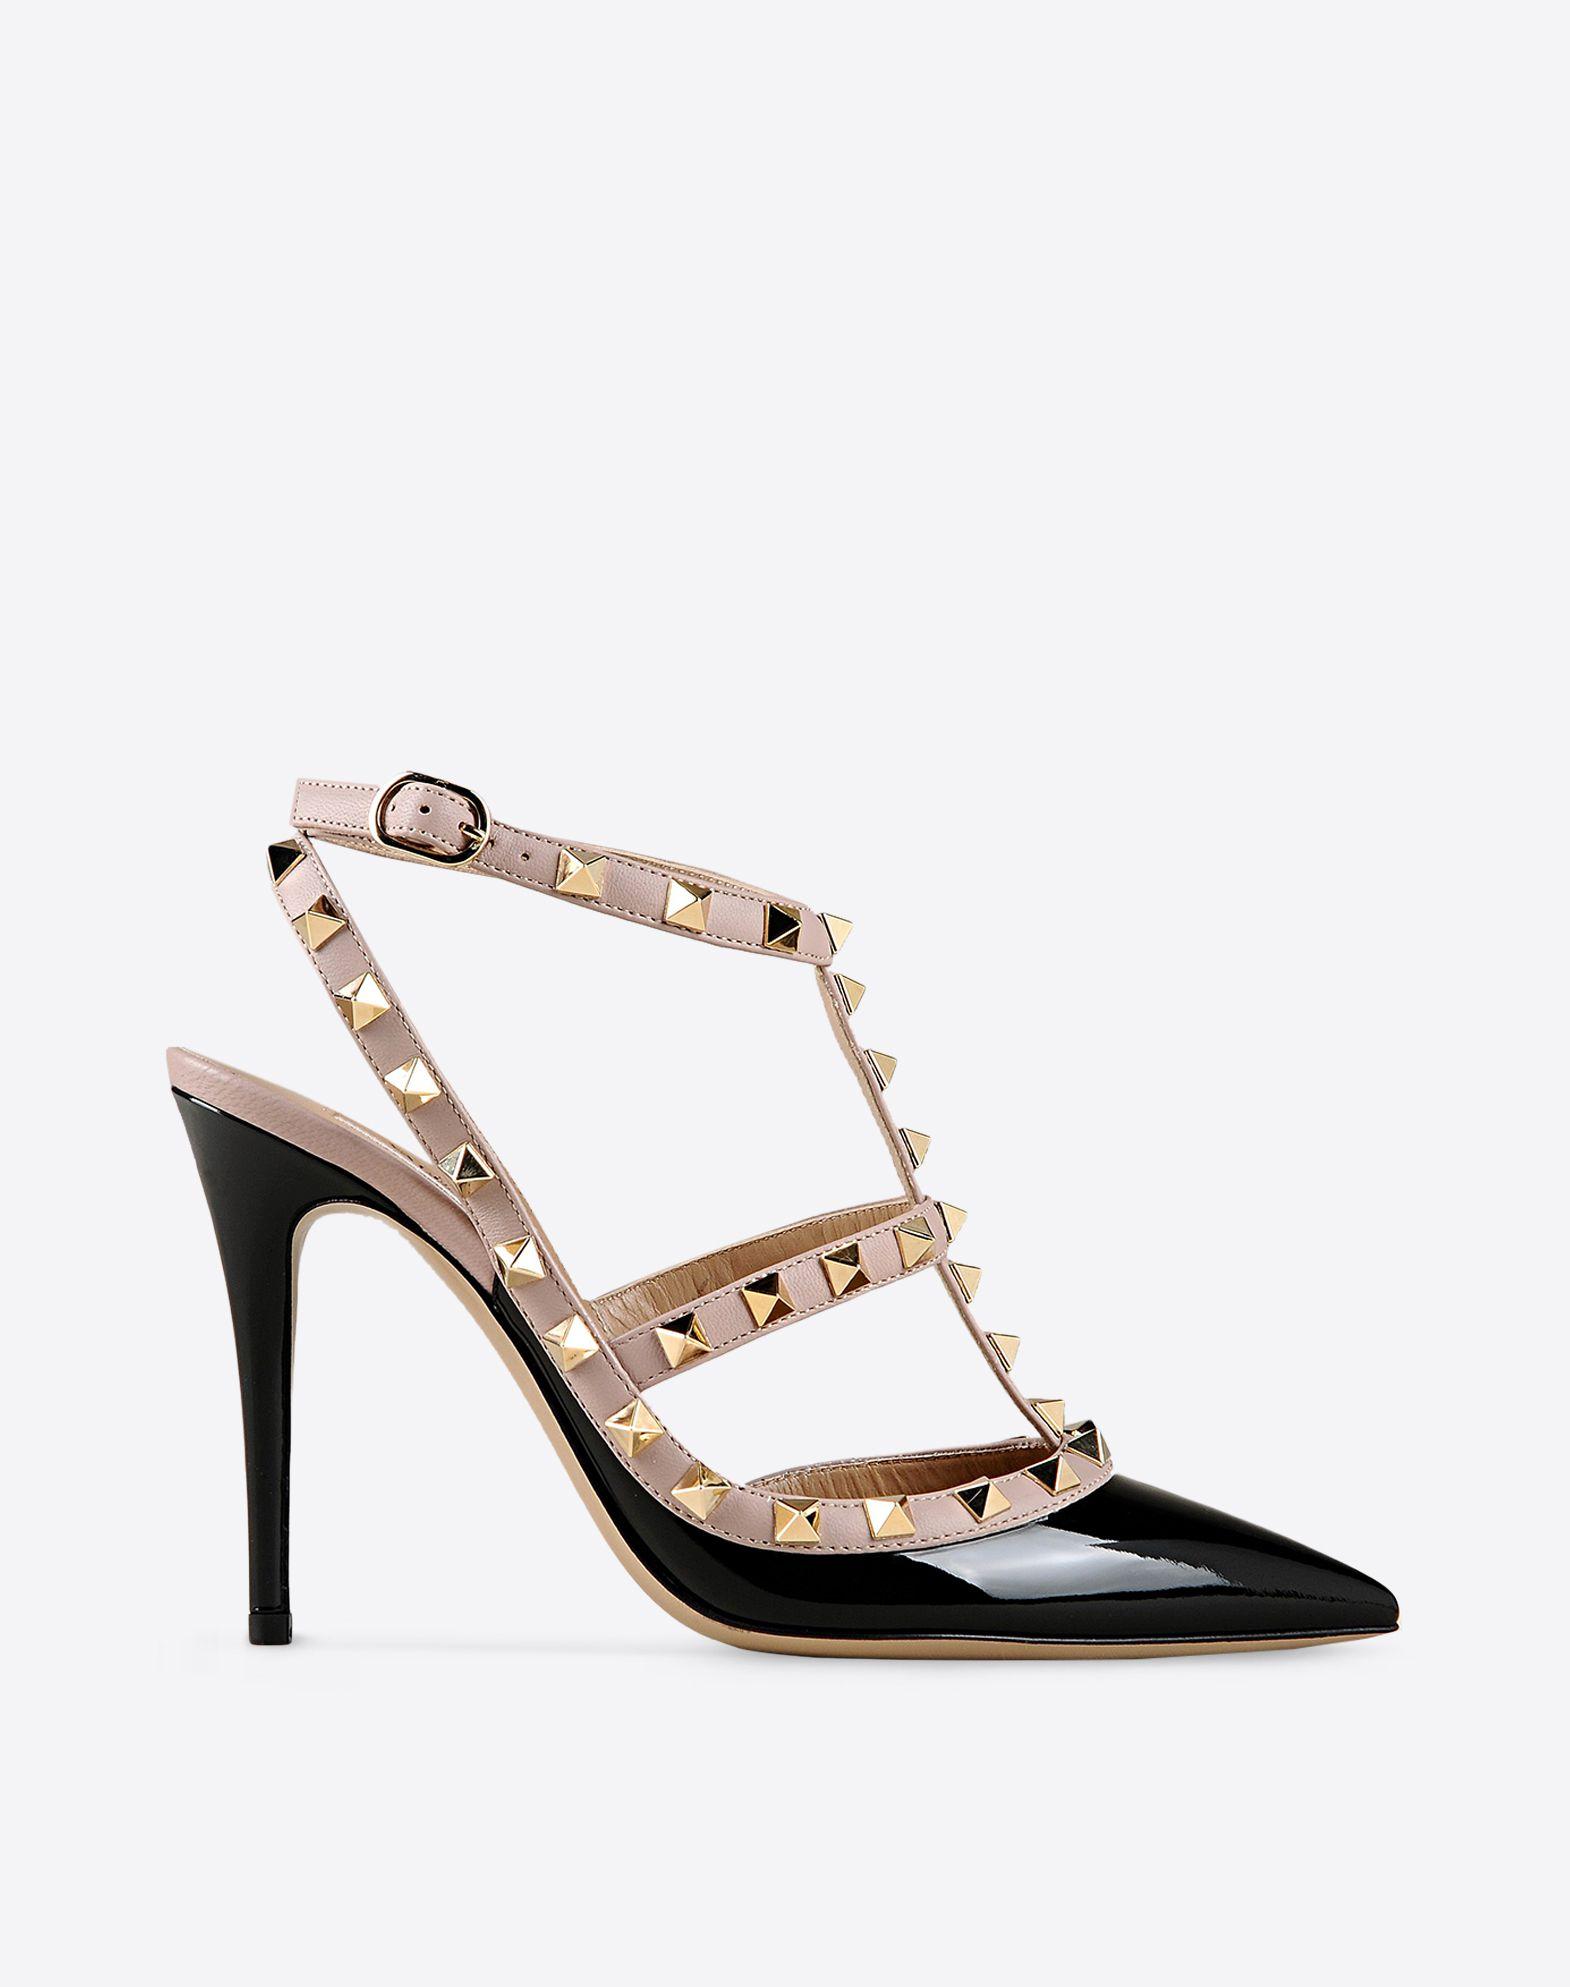 VALENTINO GARAVANI Rockstud Ankle Strap Heels Black M6503